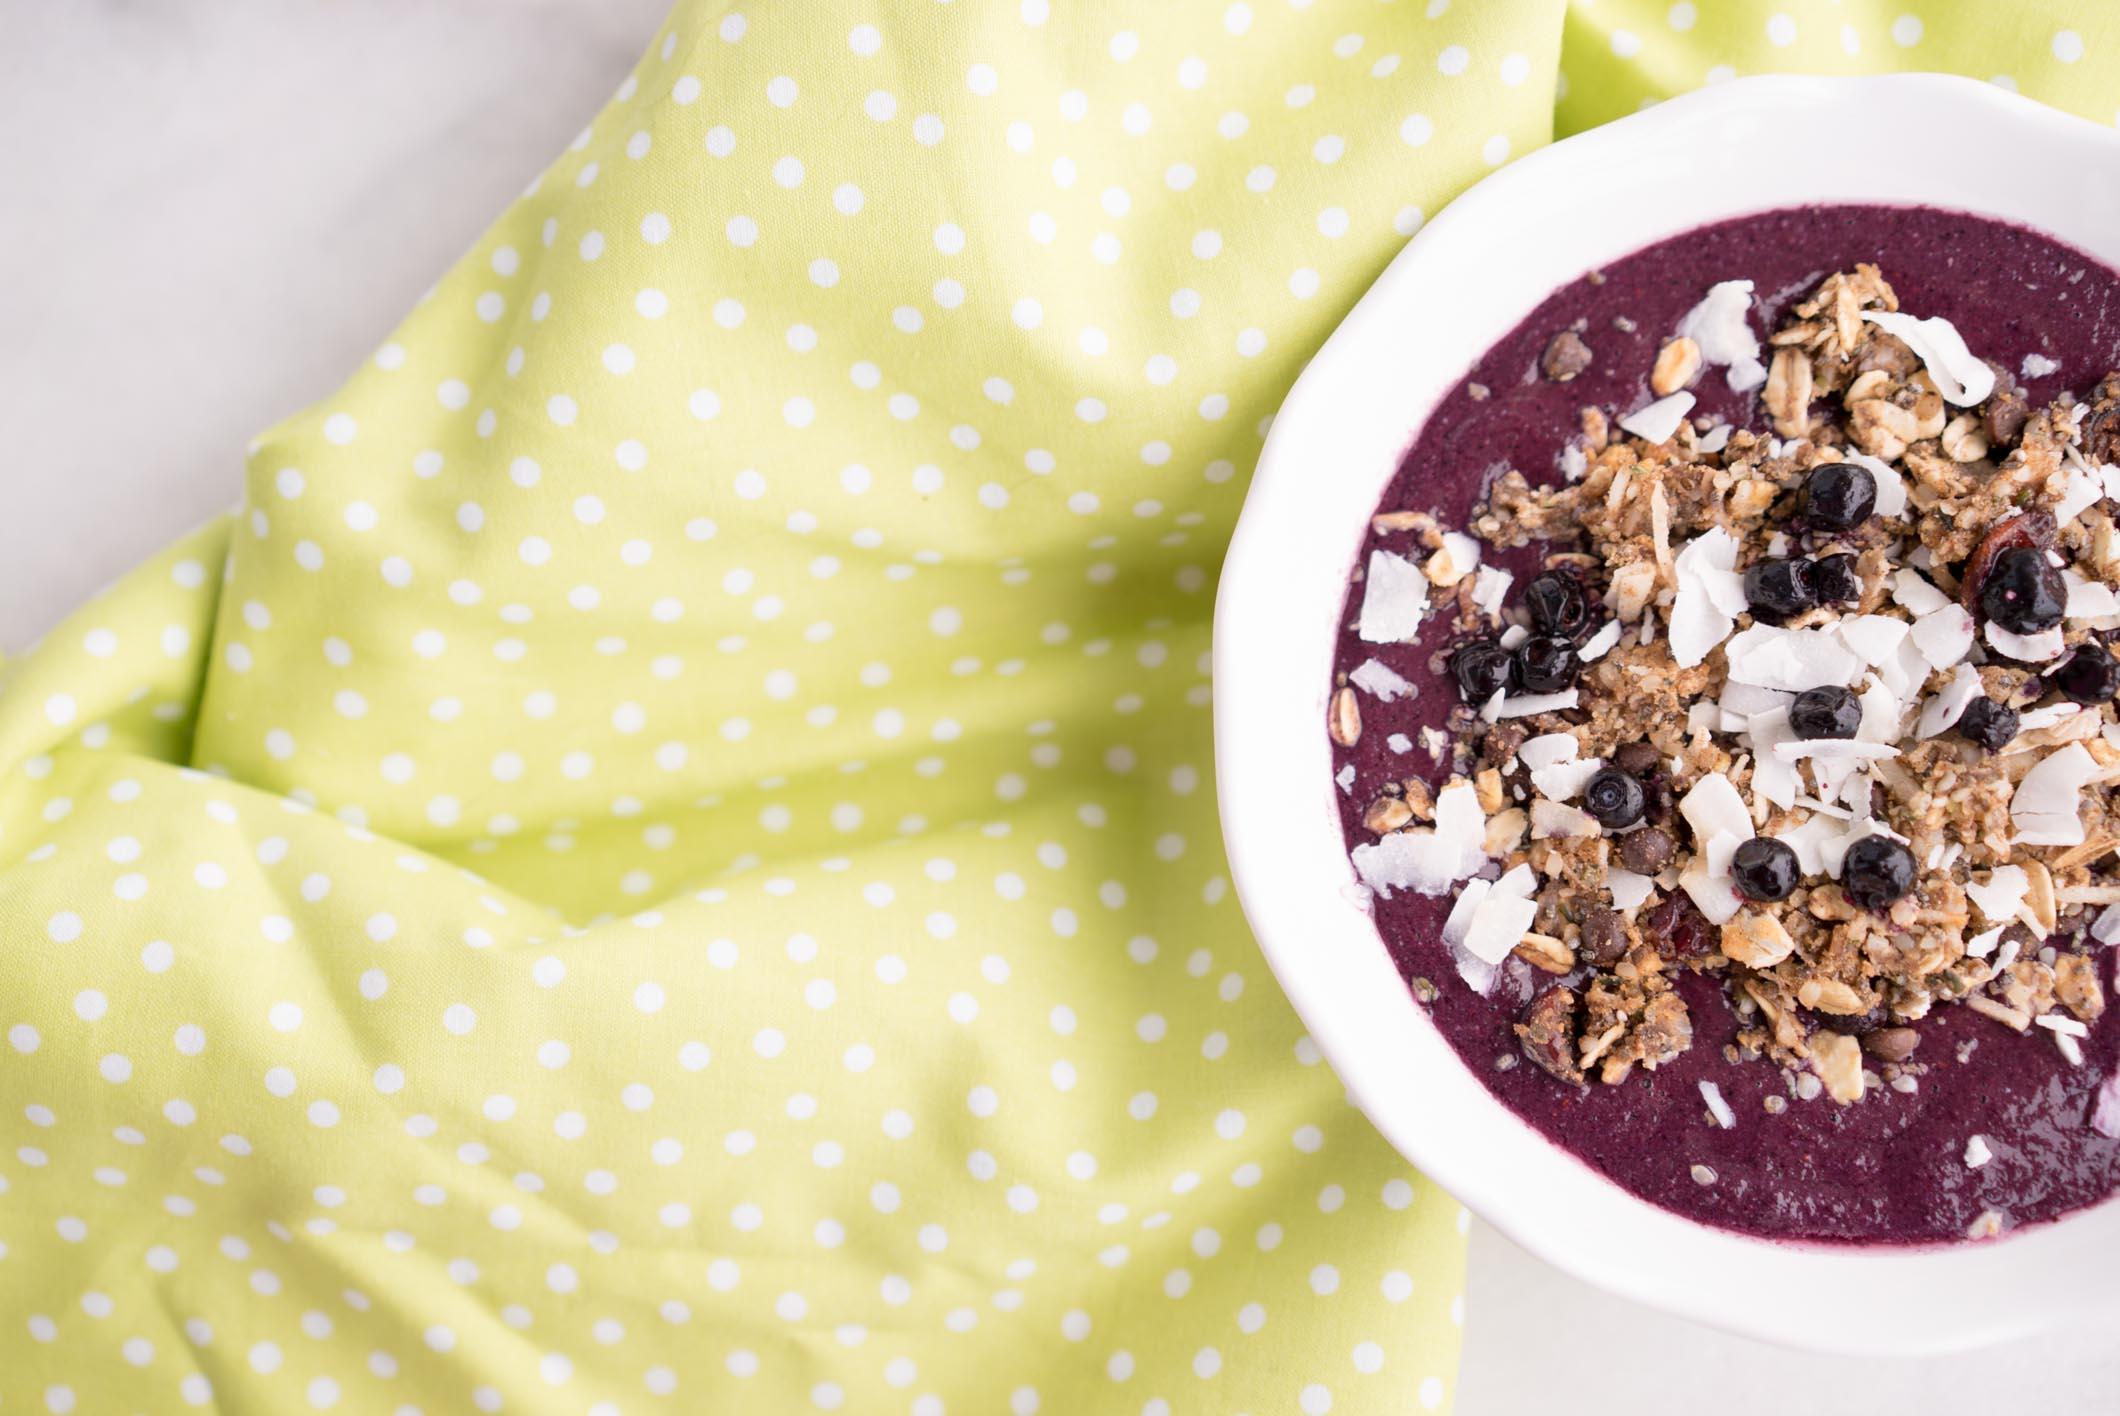 Blueberry Bliss Smoothie Bowl Recipe Joyous Health